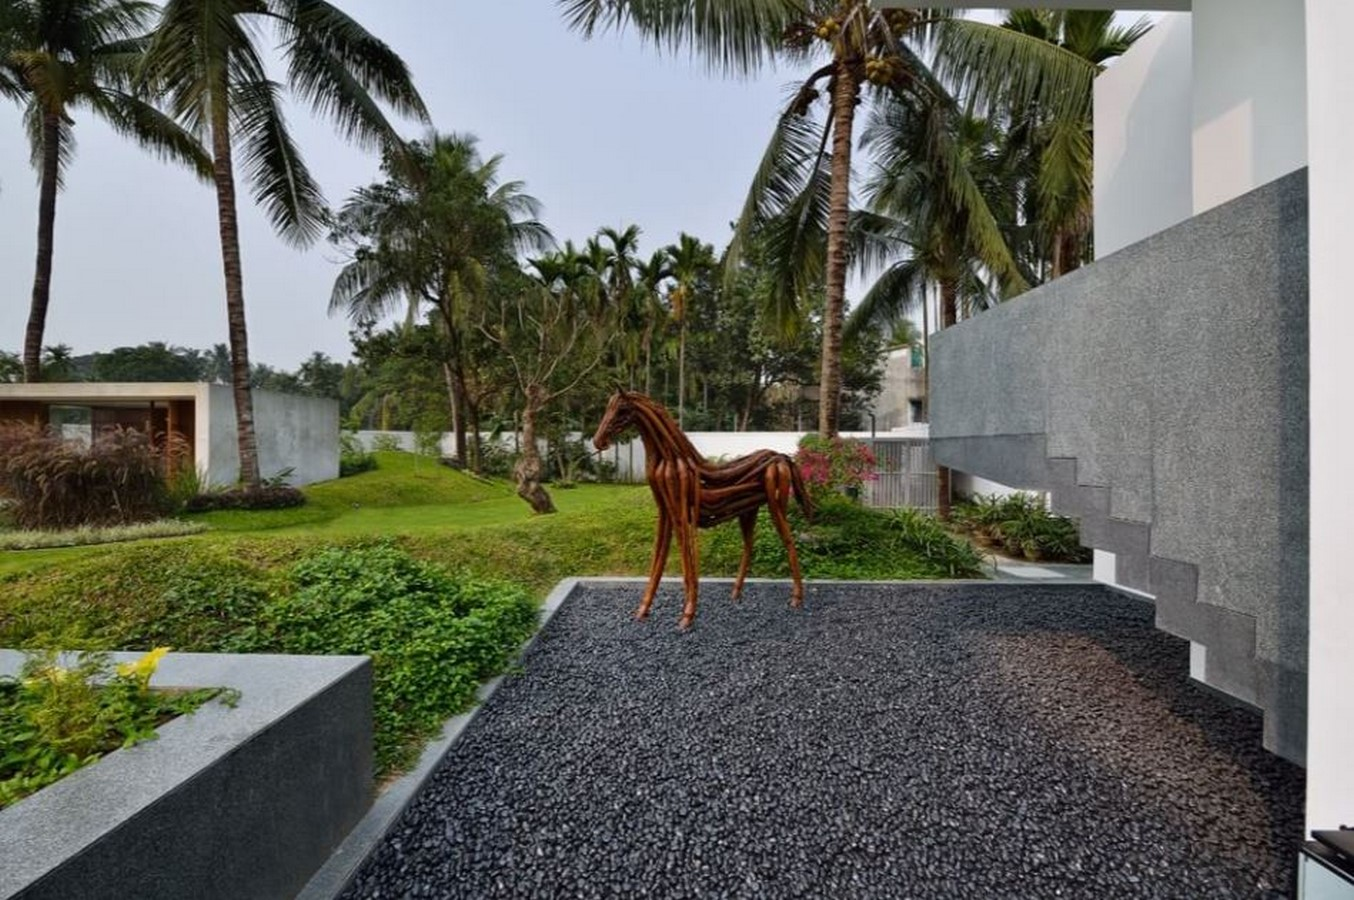 Pool House, Adisaptagram - Sheet4